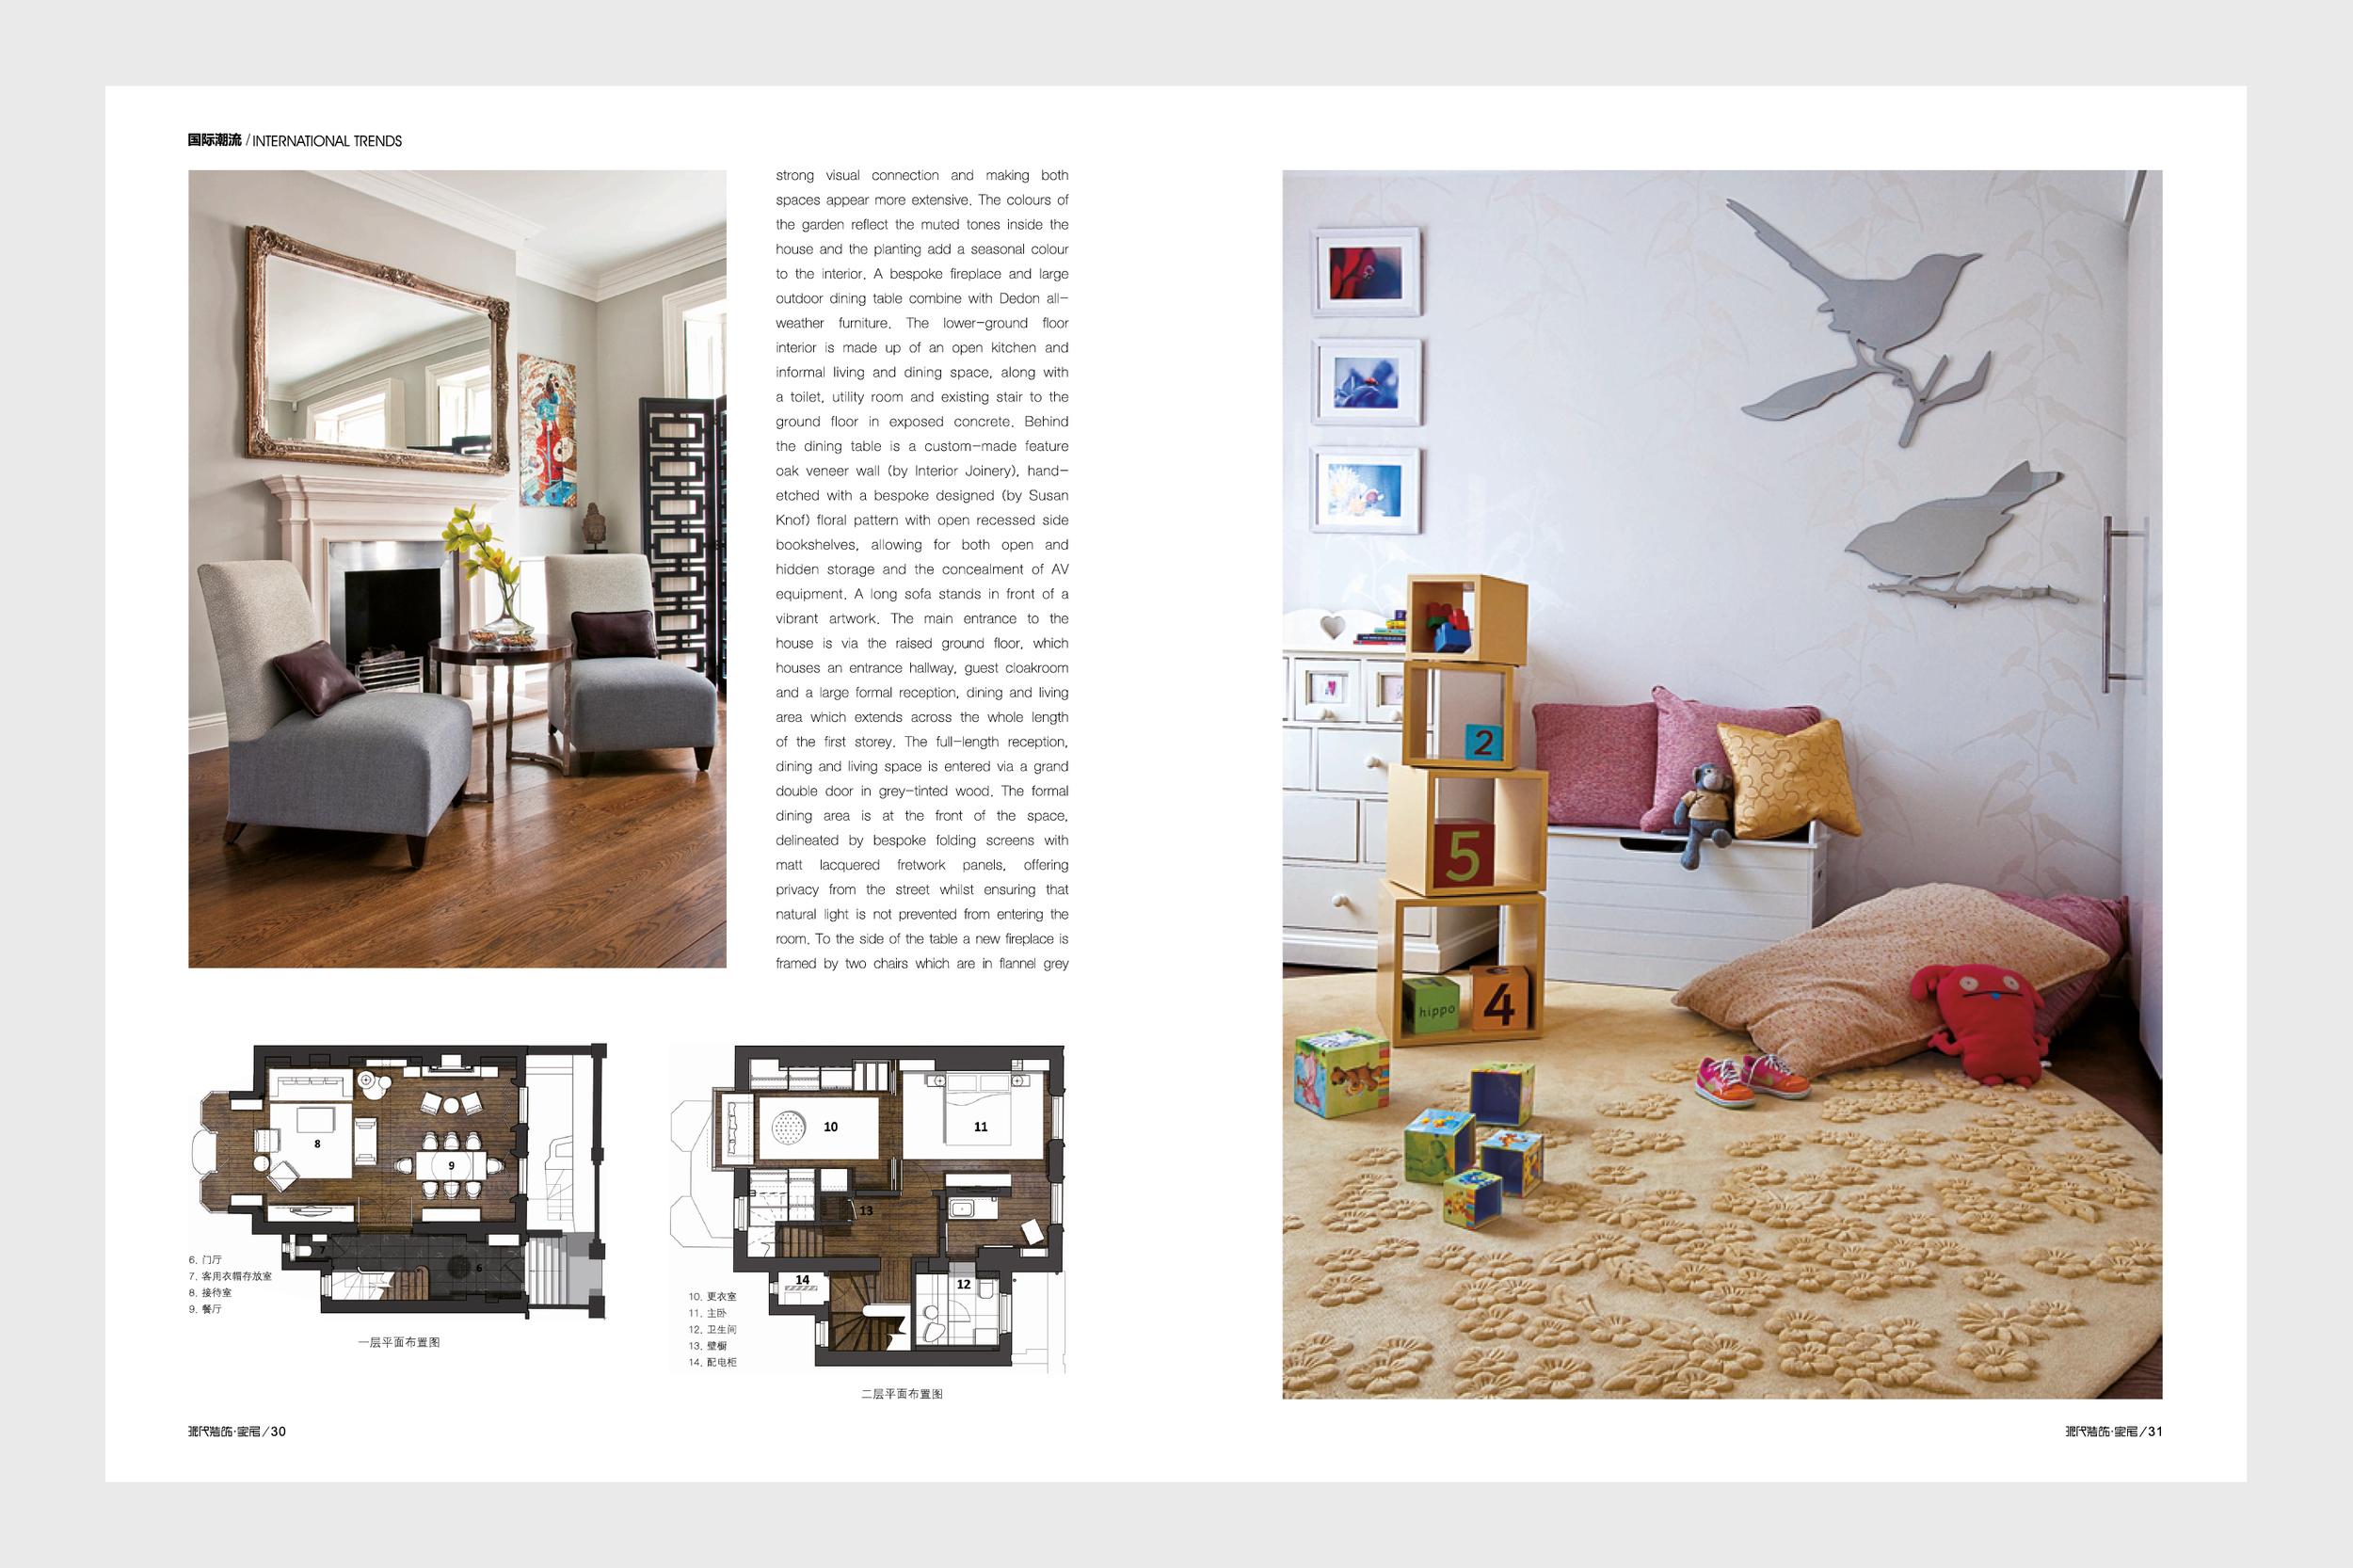 knof-press--modern-decoration-home--2011-06_05.jpg